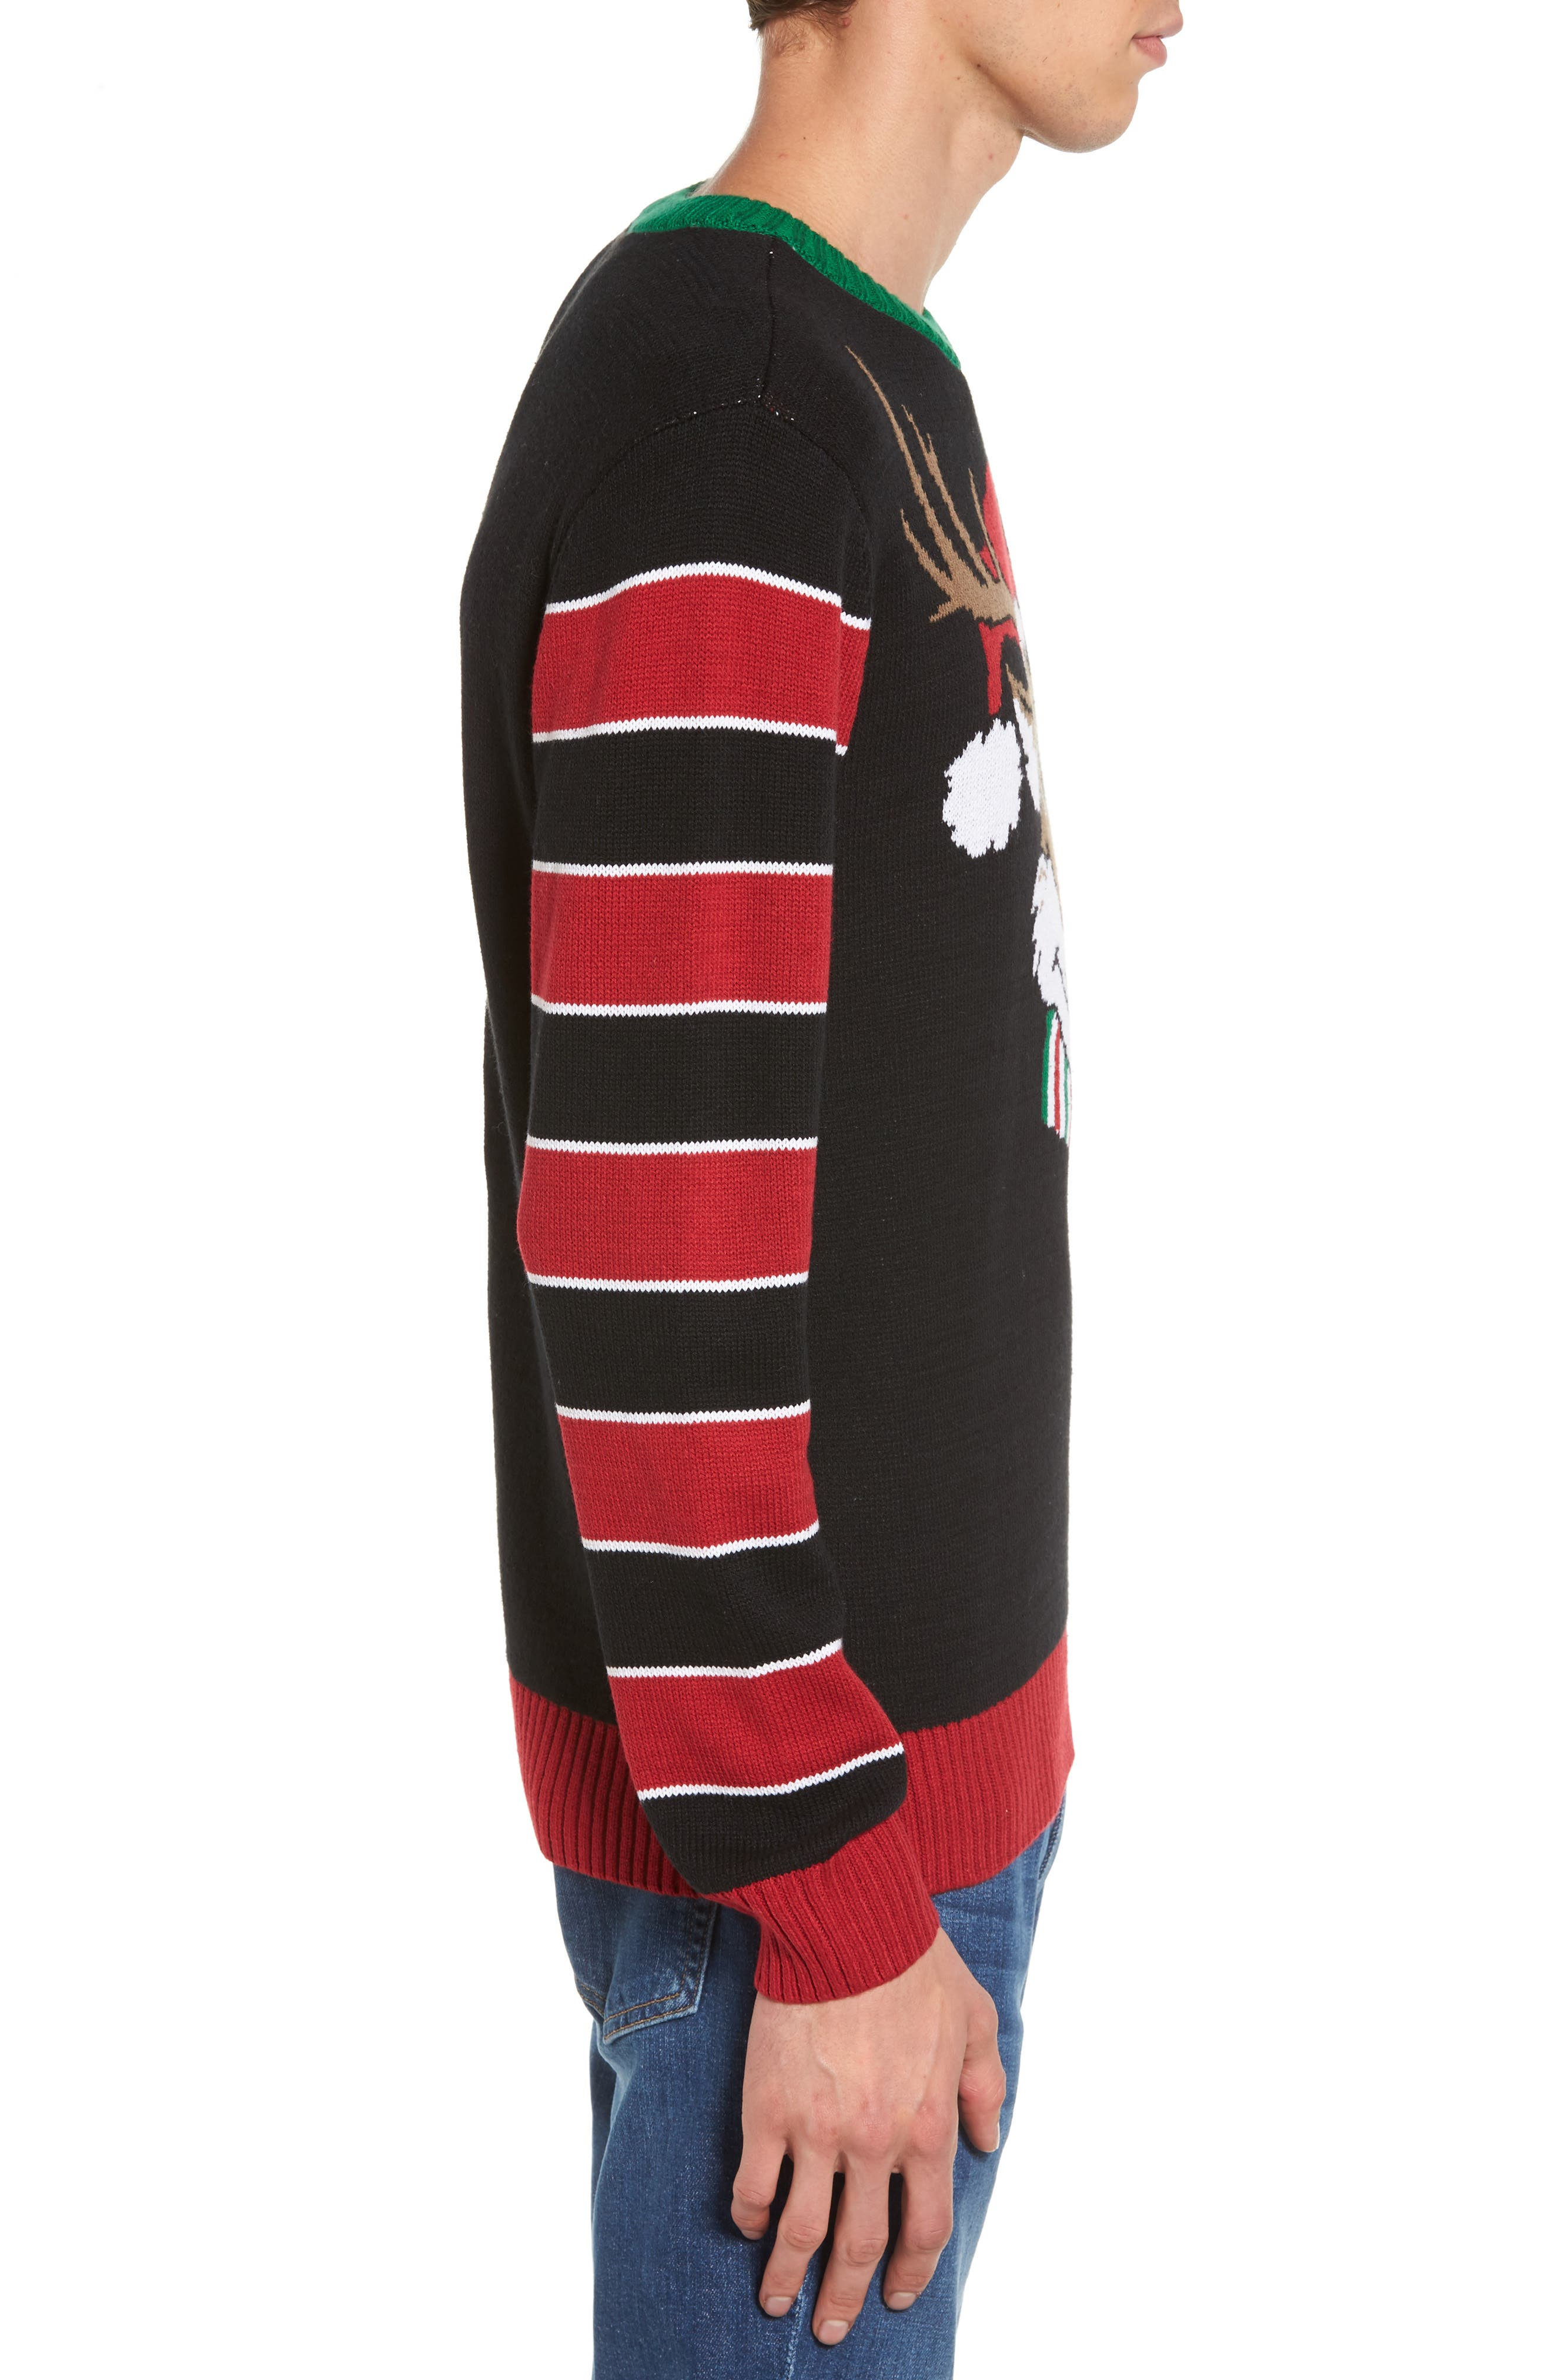 Reindeer Sweater,                             Alternate thumbnail 3, color,                             001